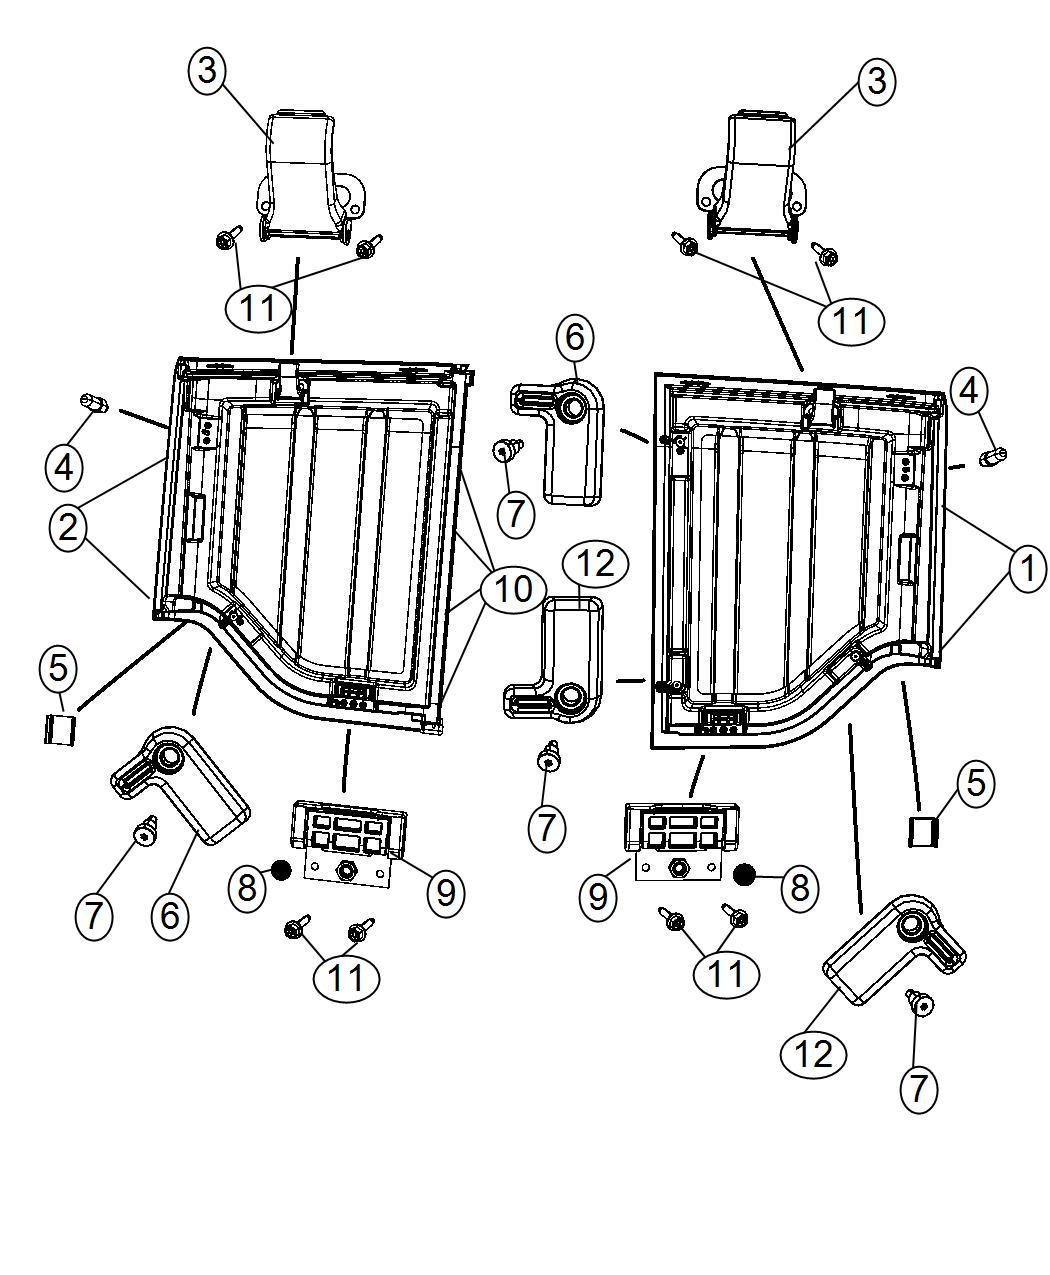 tags: #1997 jeep wrangler interior#jeep wrangler service manual#1997 jeep  wrangler black#1997 jeep wrangler color chips#1997 jeep wrangler sound  bar#1997